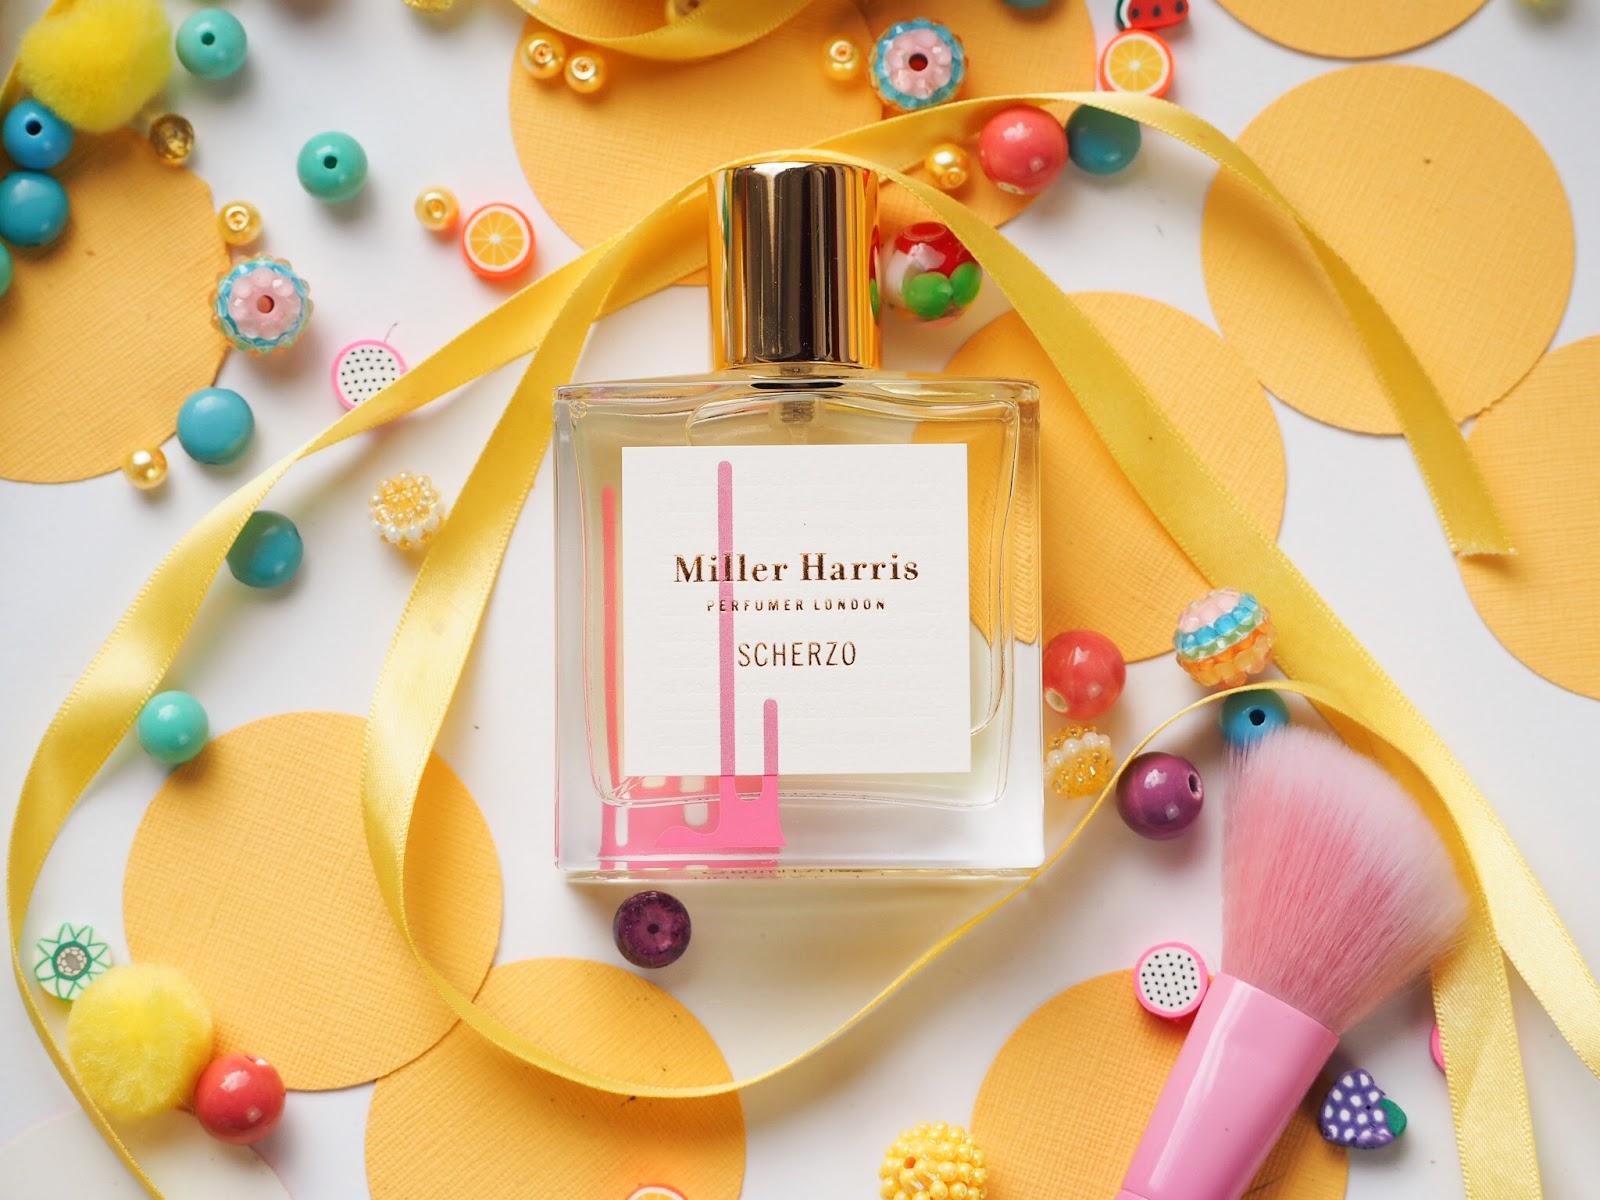 World Duty Free: Miller Harris Scherzo Perfume*